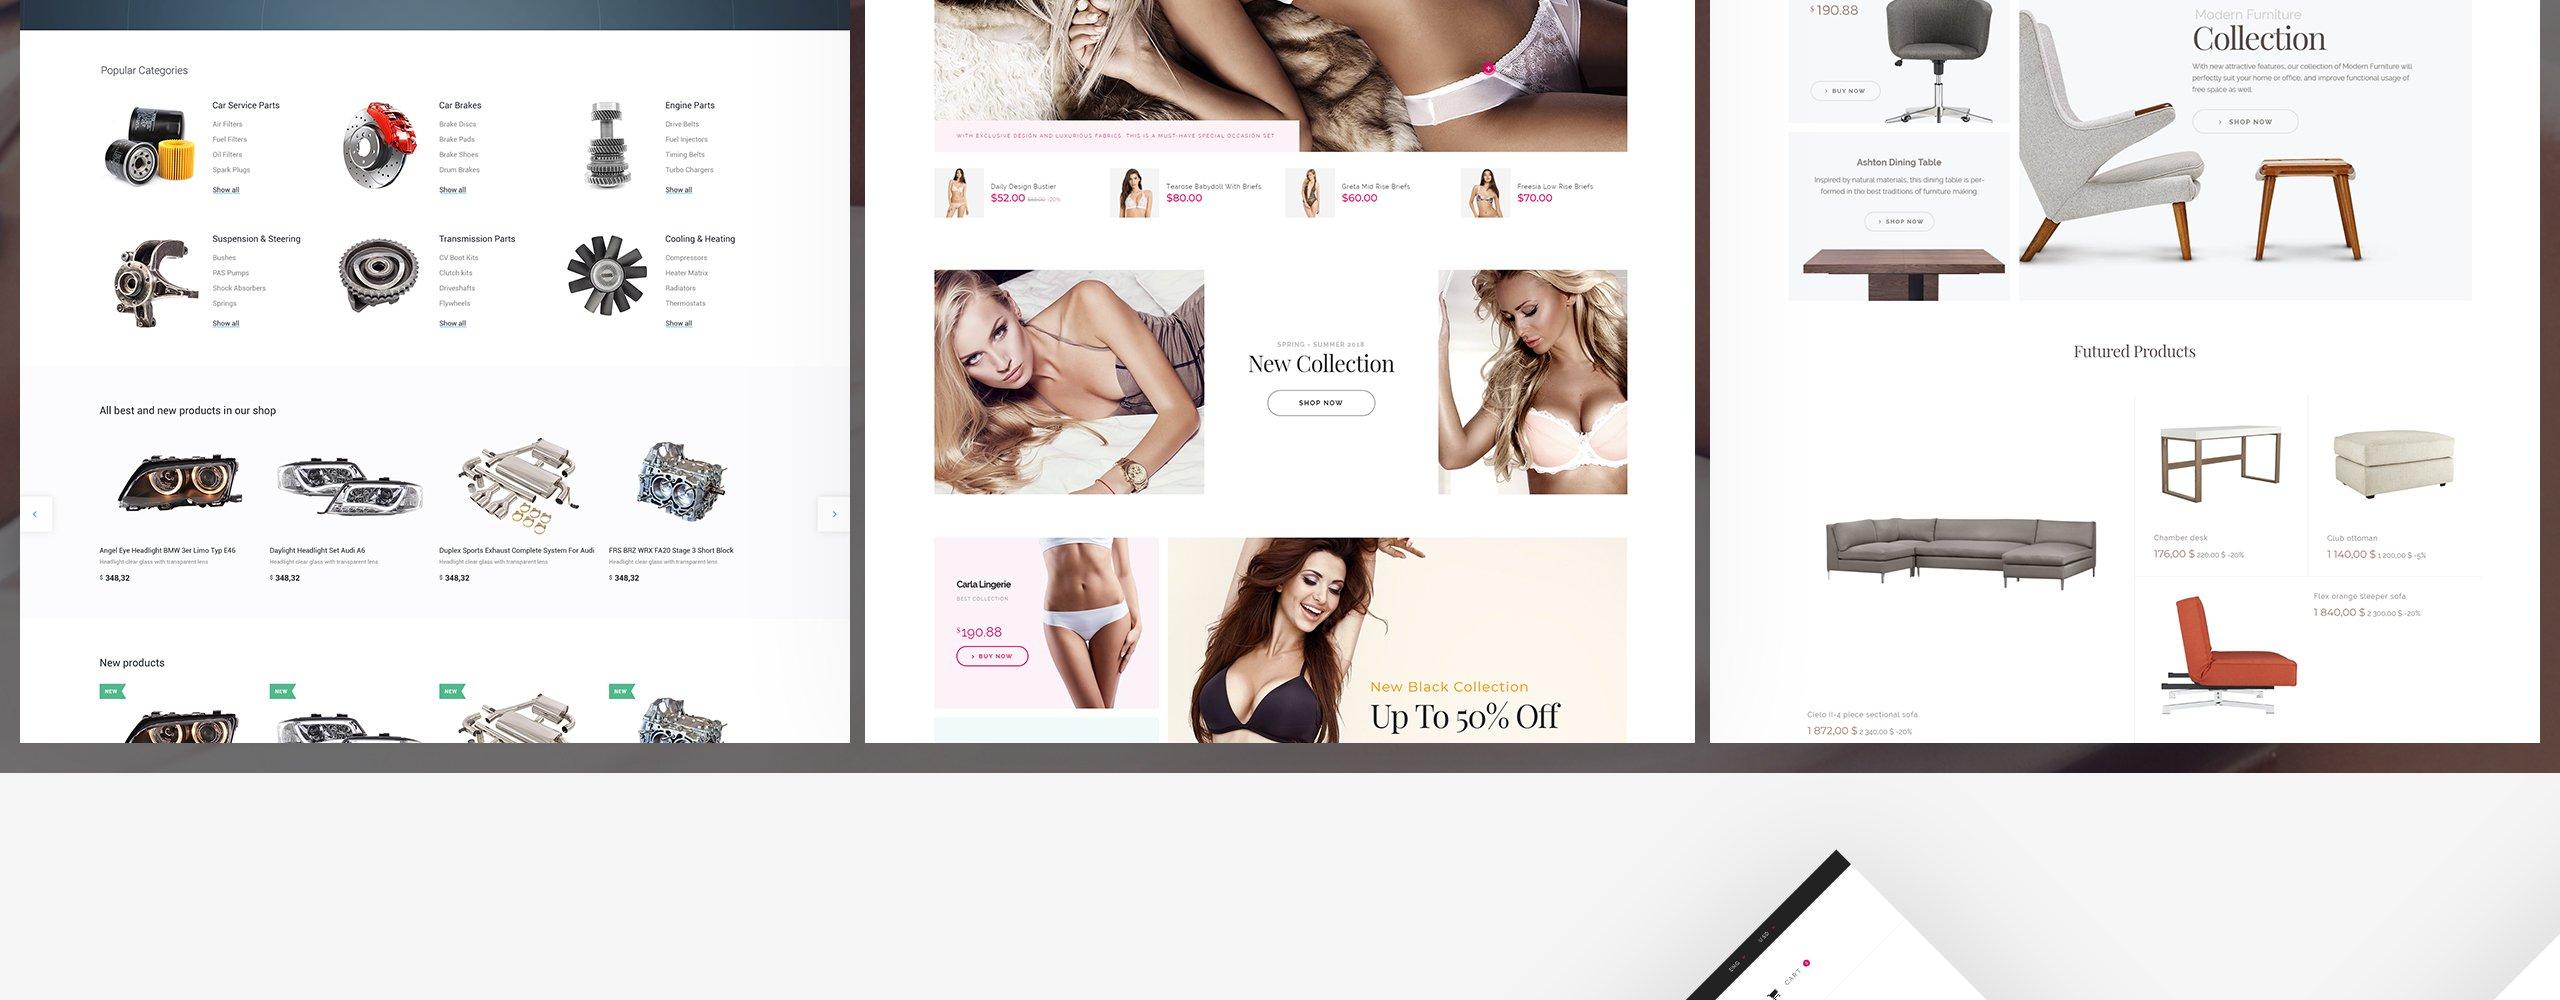 Website Design Template 70515 - prestashop